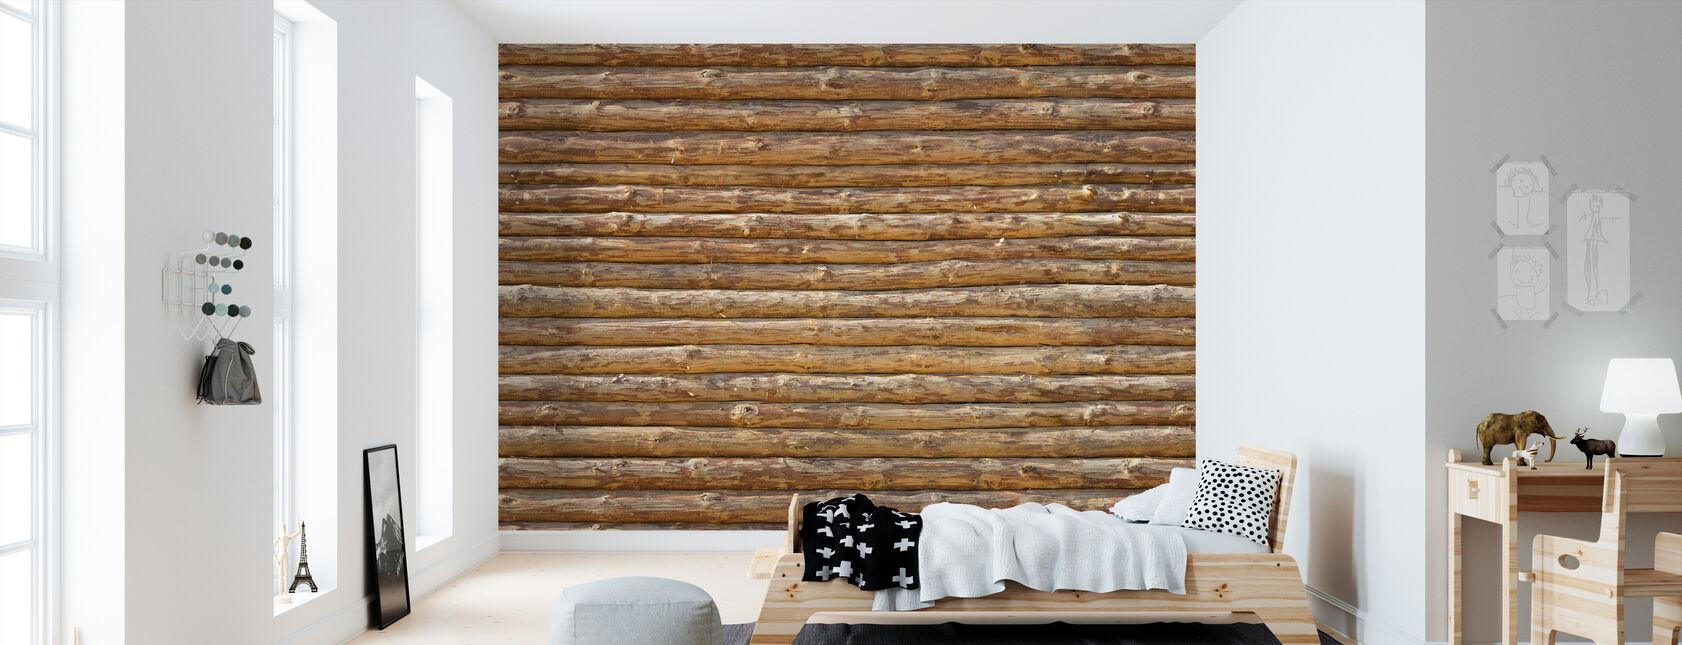 Wooden Logs Wall - Wallpaper - Kids Room